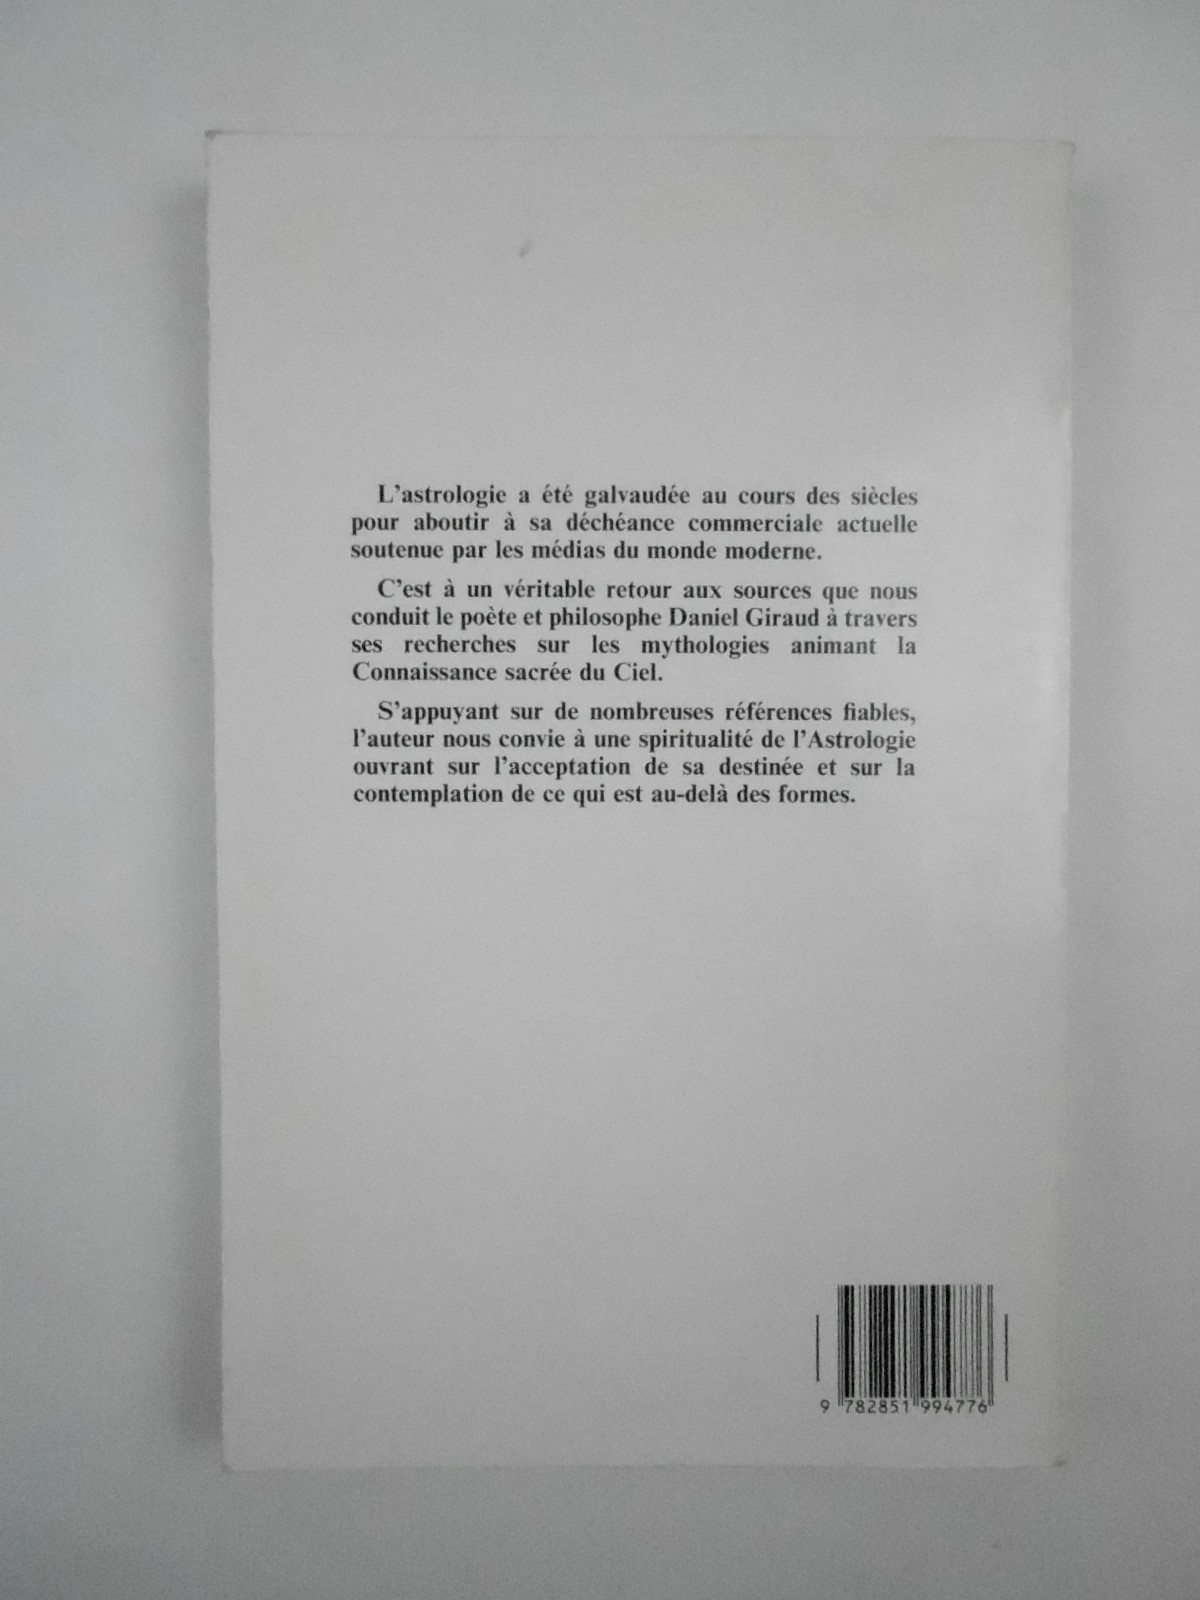 18158_1